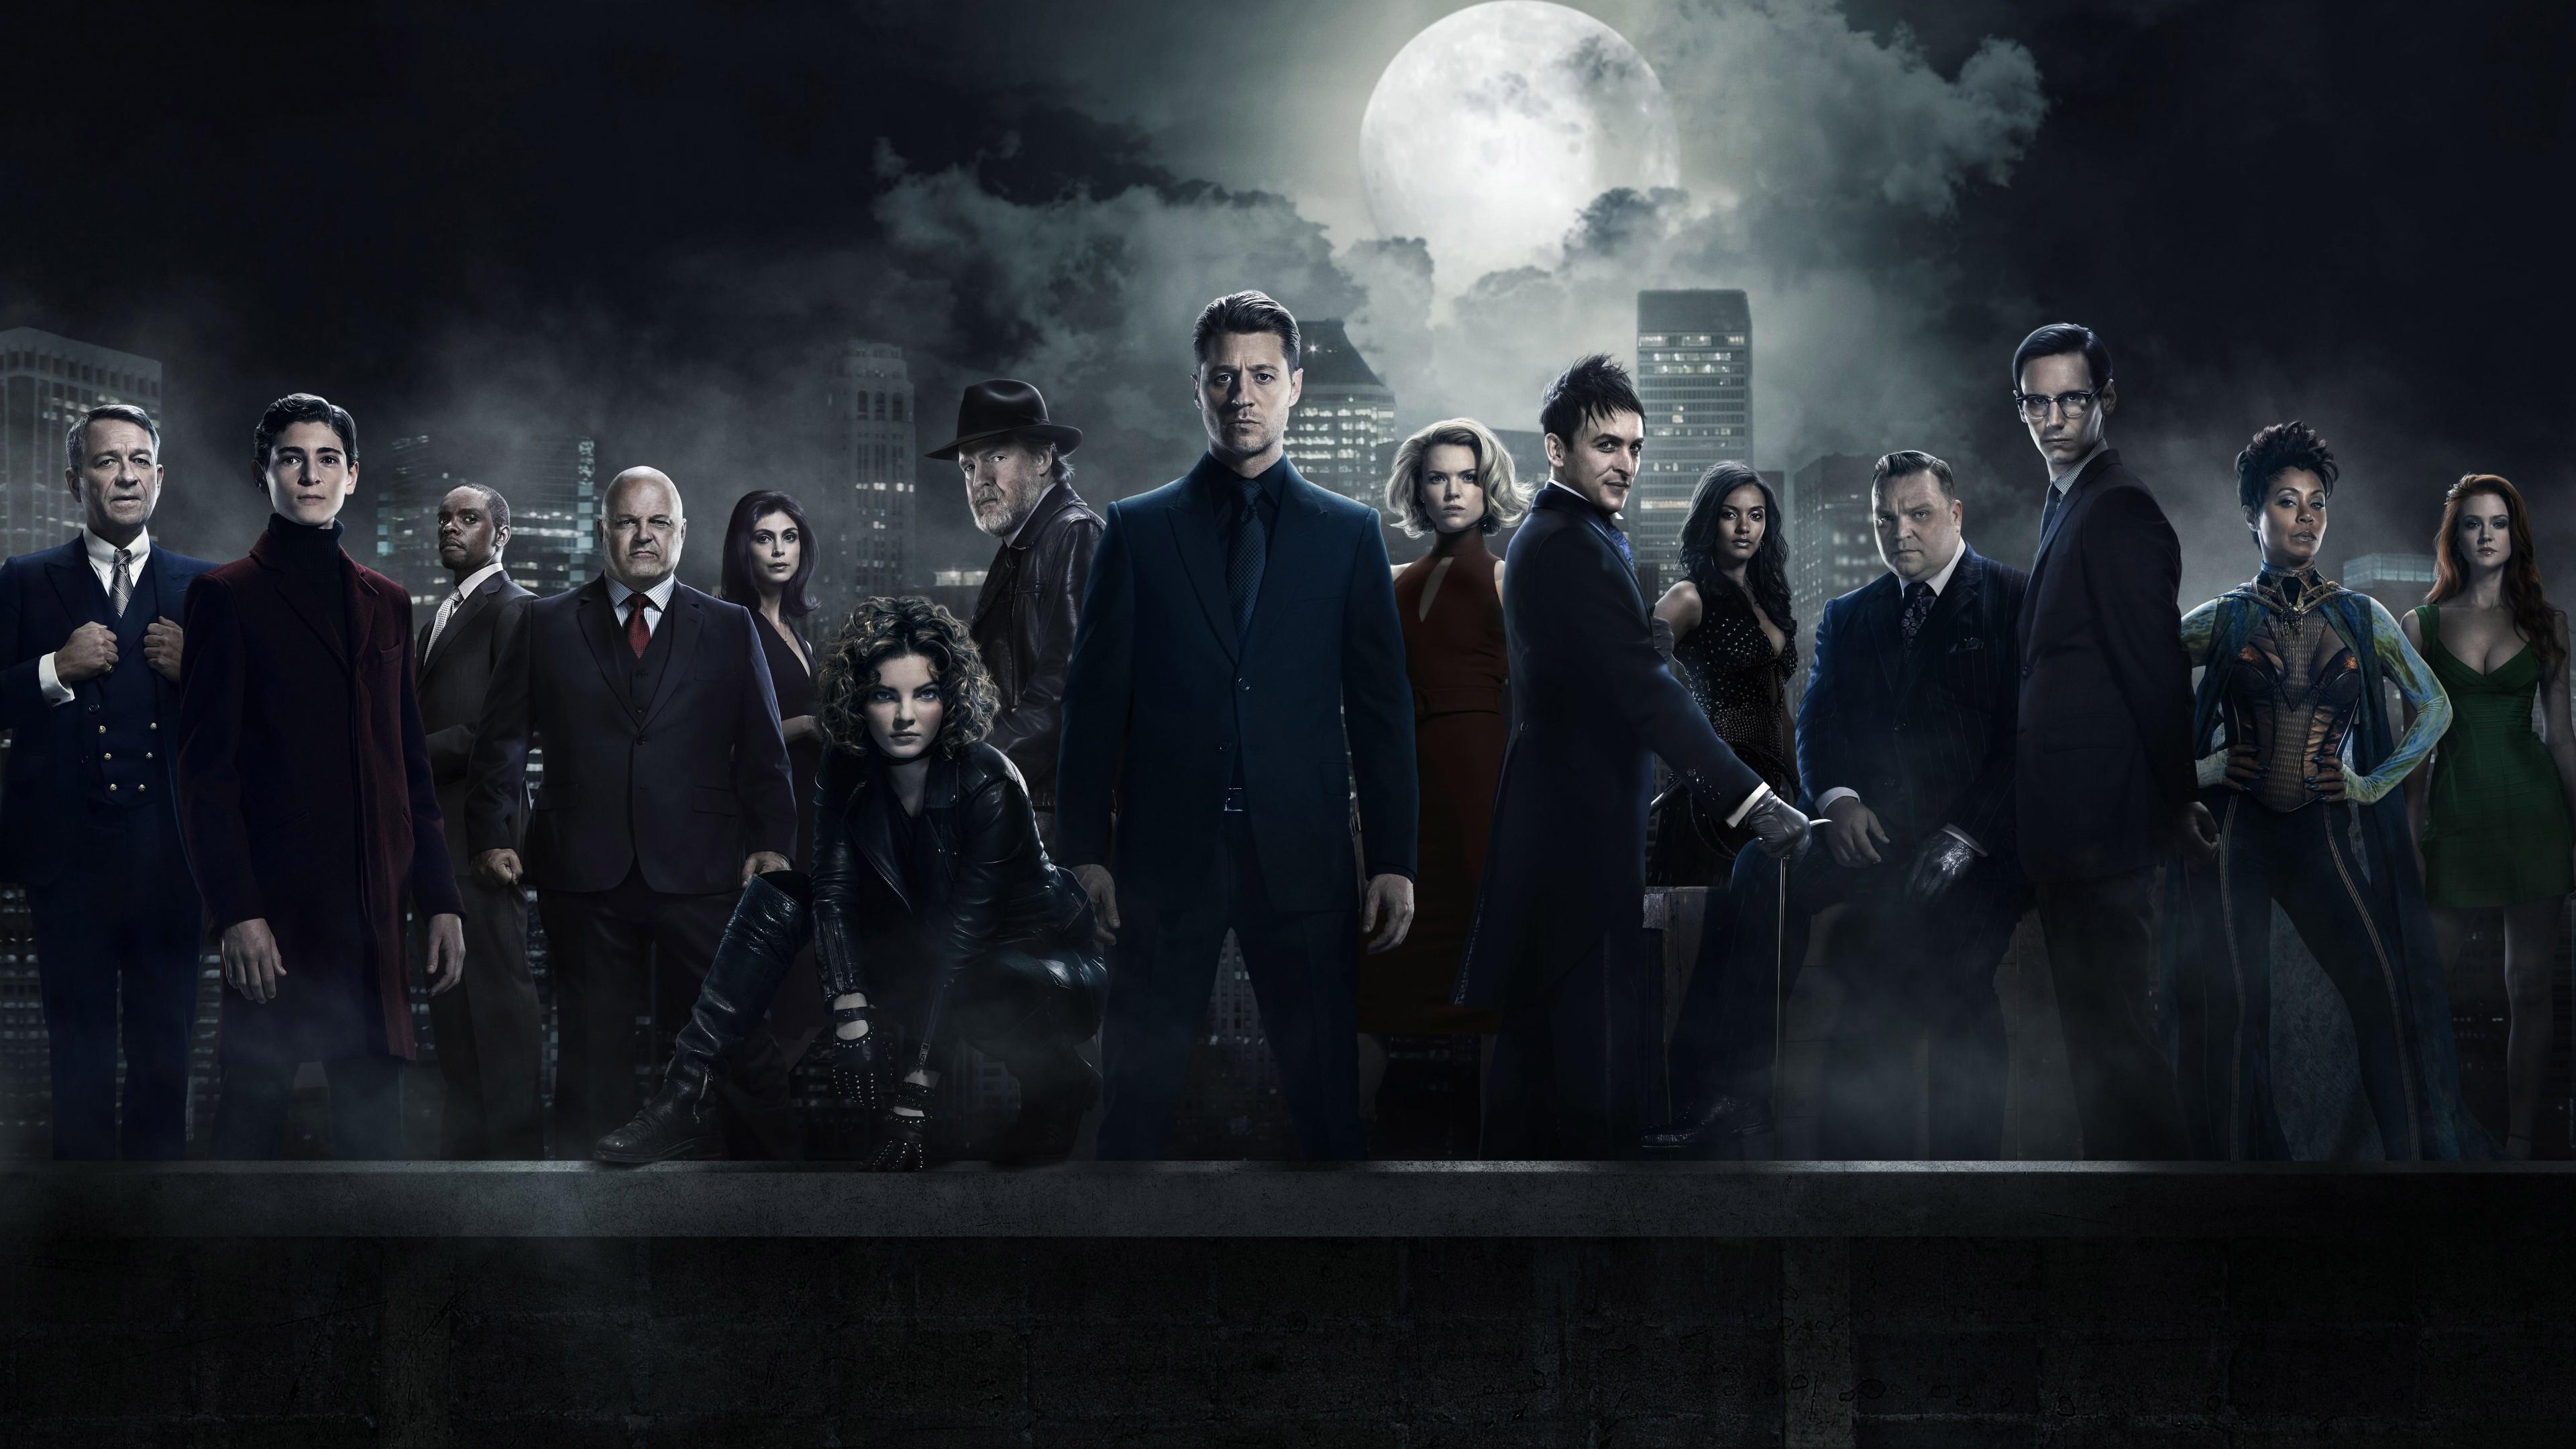 Wallpaper Gotham 3 season, Gotham, TV Series, crime, Movies